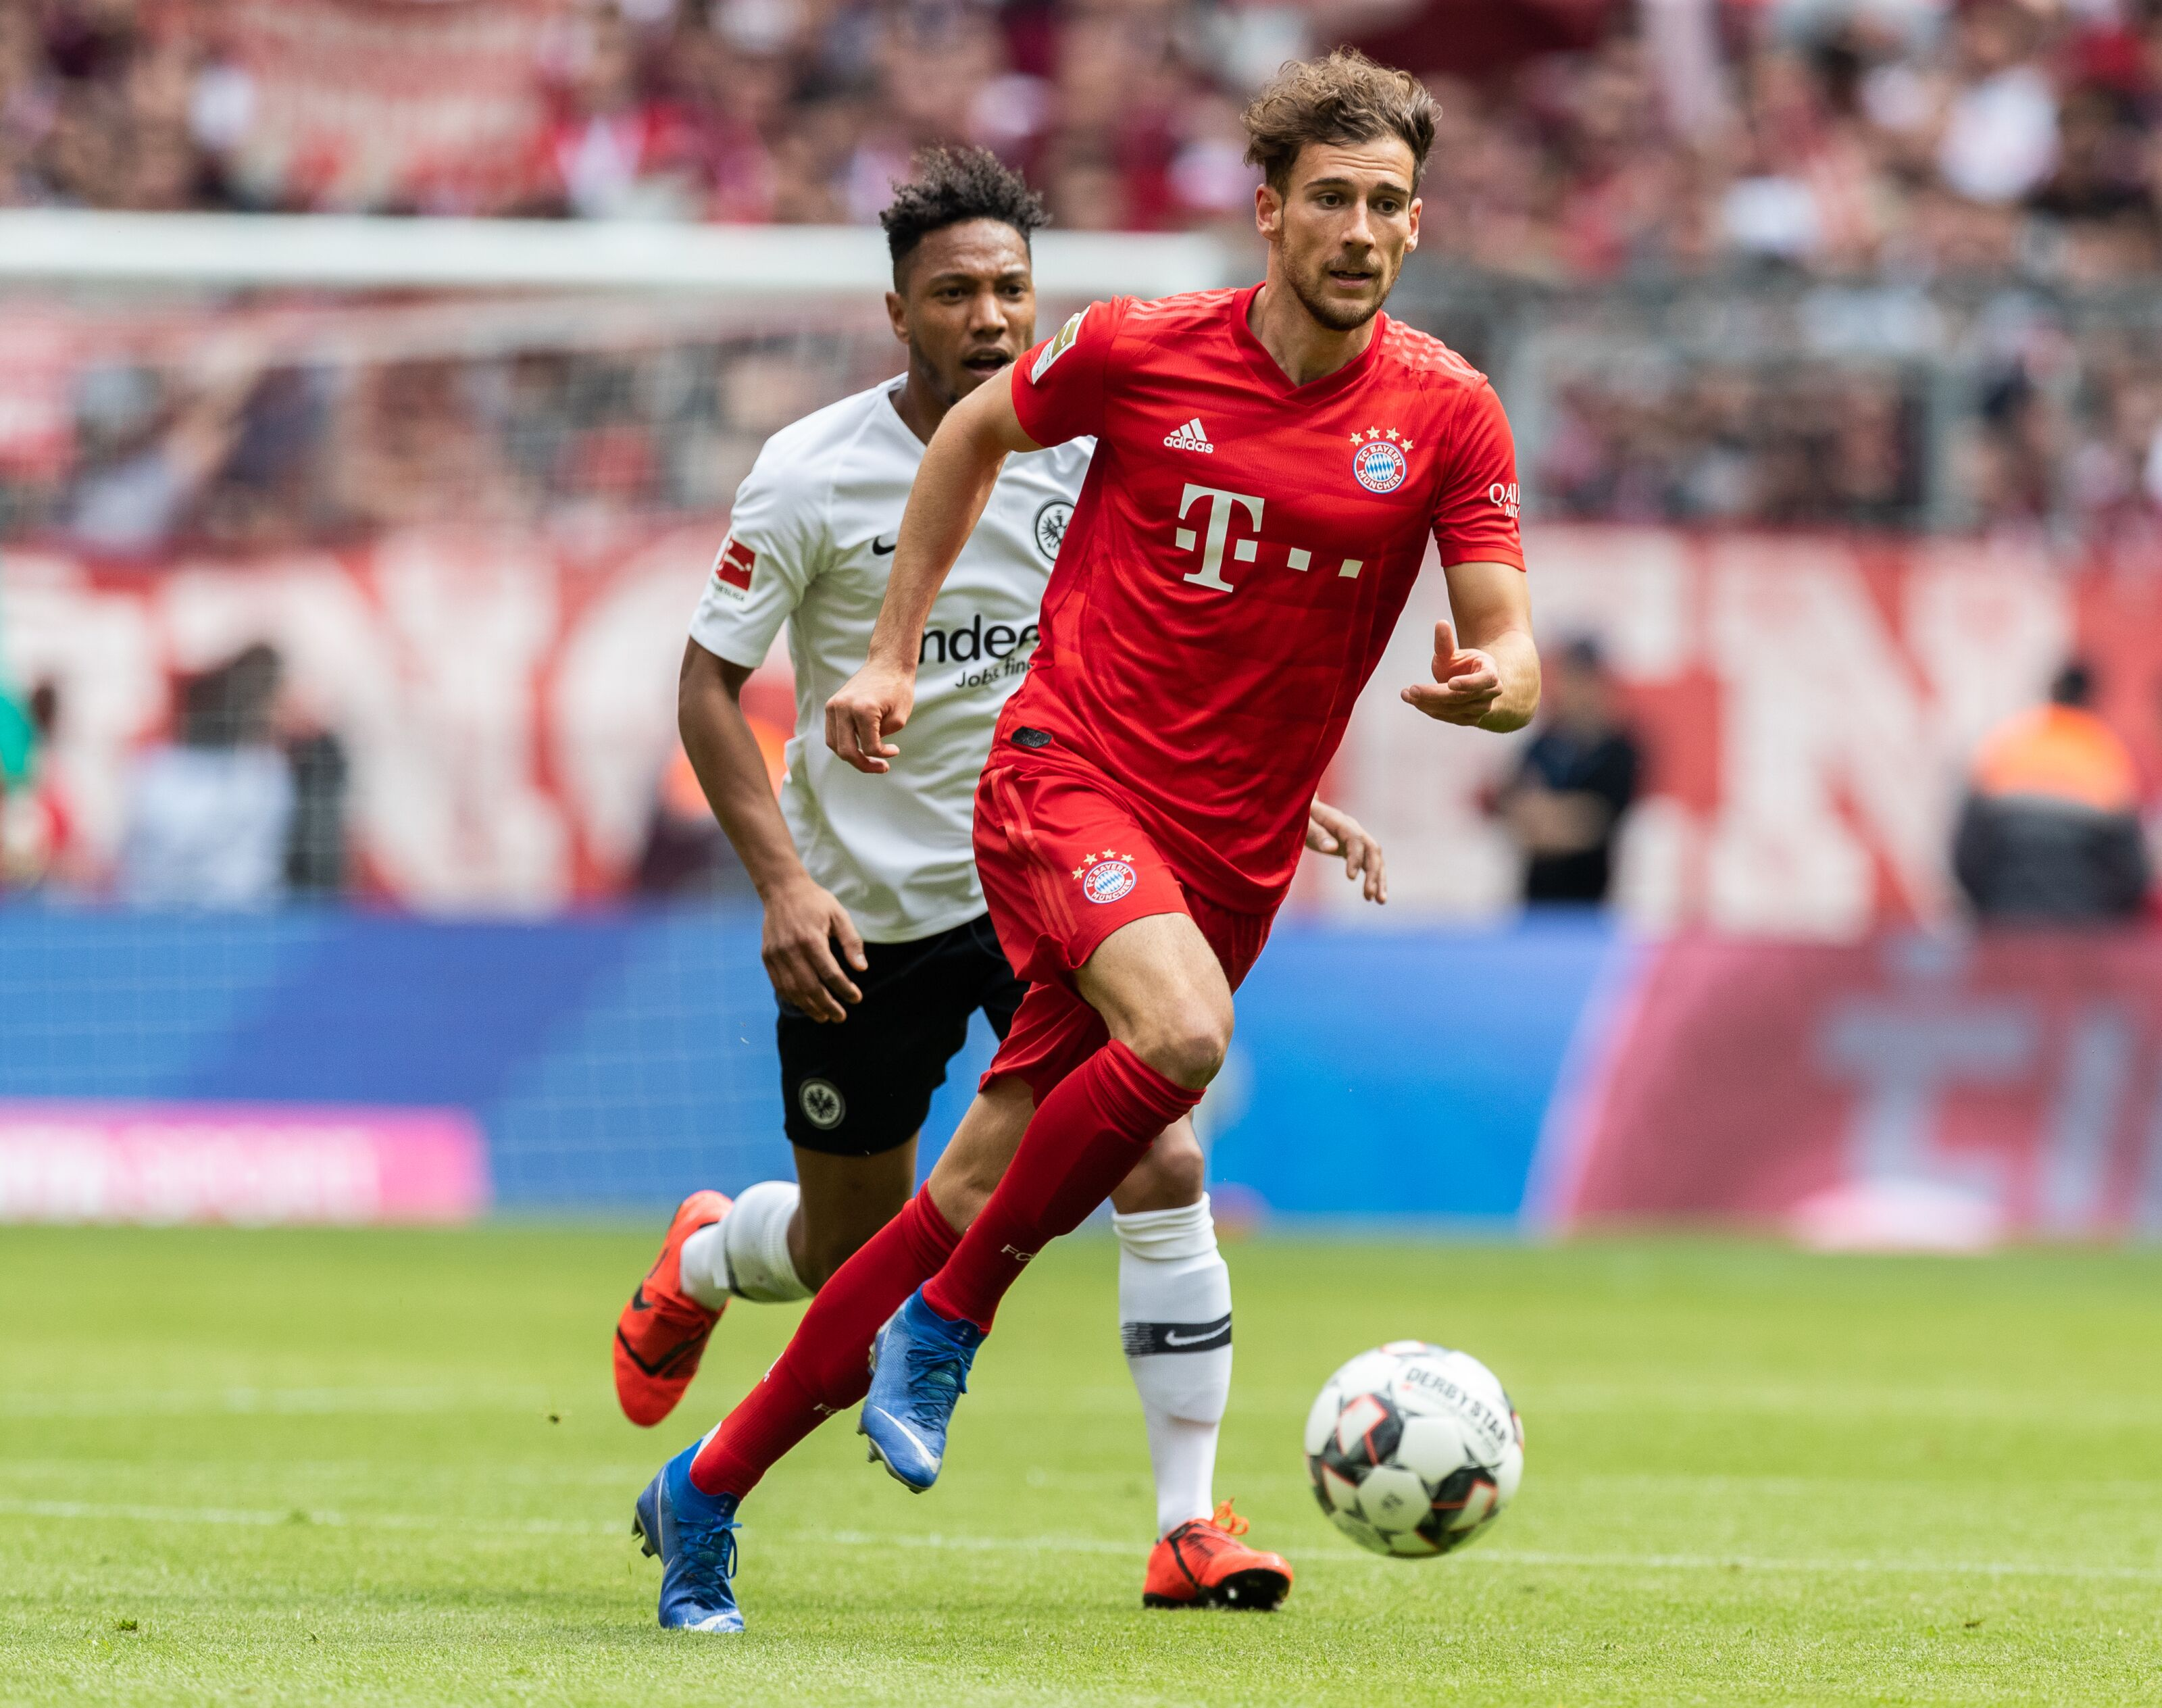 Leon Goretzka is pleased with his debut season at Bayern Munich